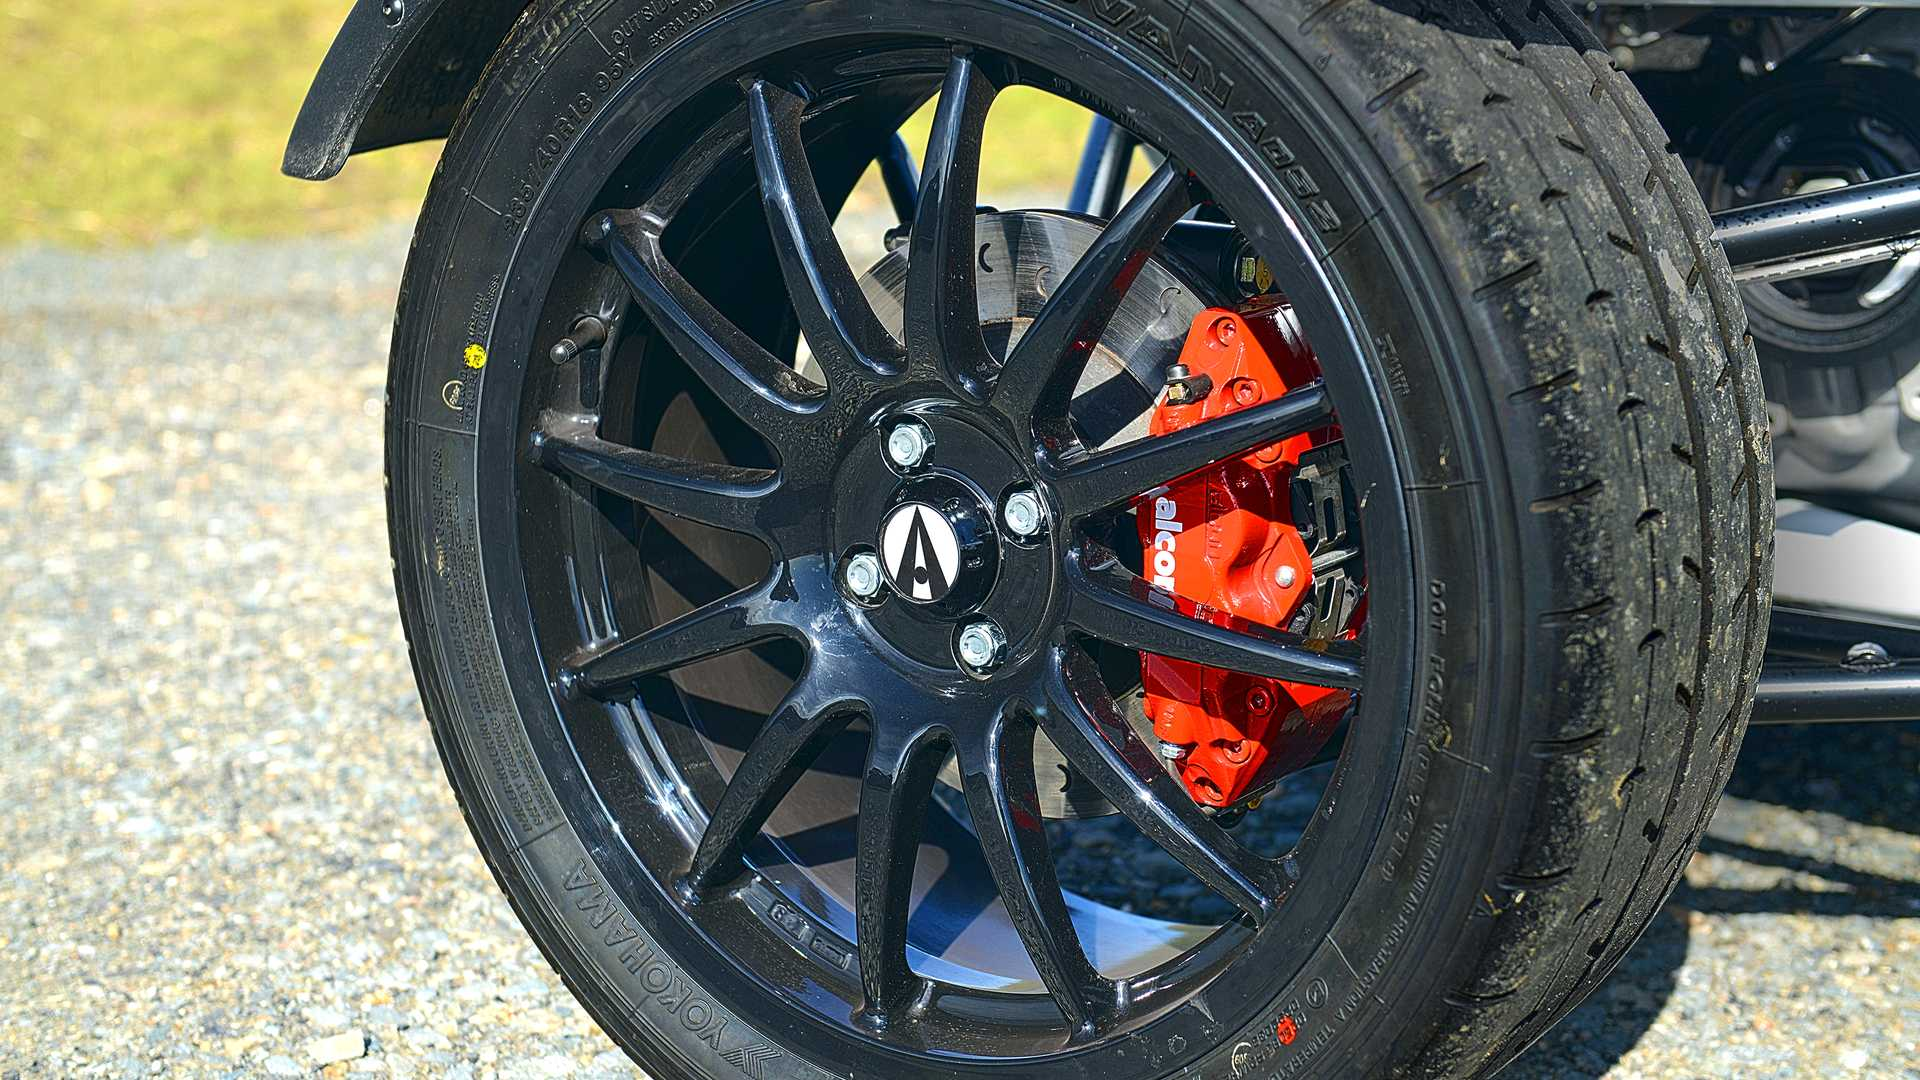 2021 Ariel Nomad R Wheel Tire Brake